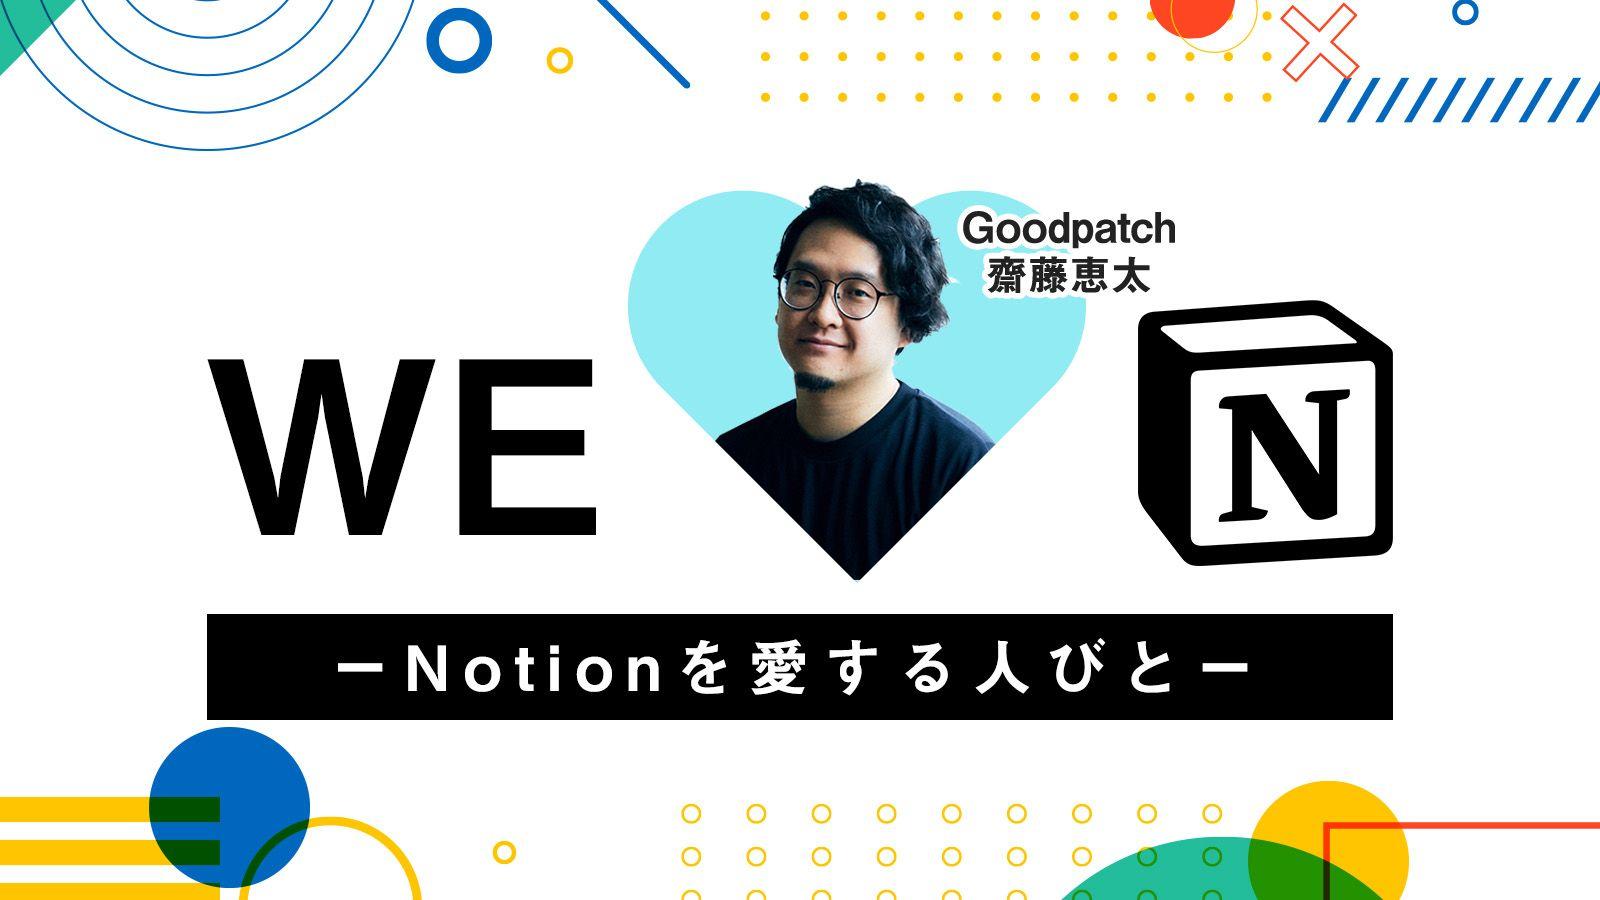 Notionは、僕らのオフィス。Goodpatch AnywhereのNotion活用法|齋藤恵太